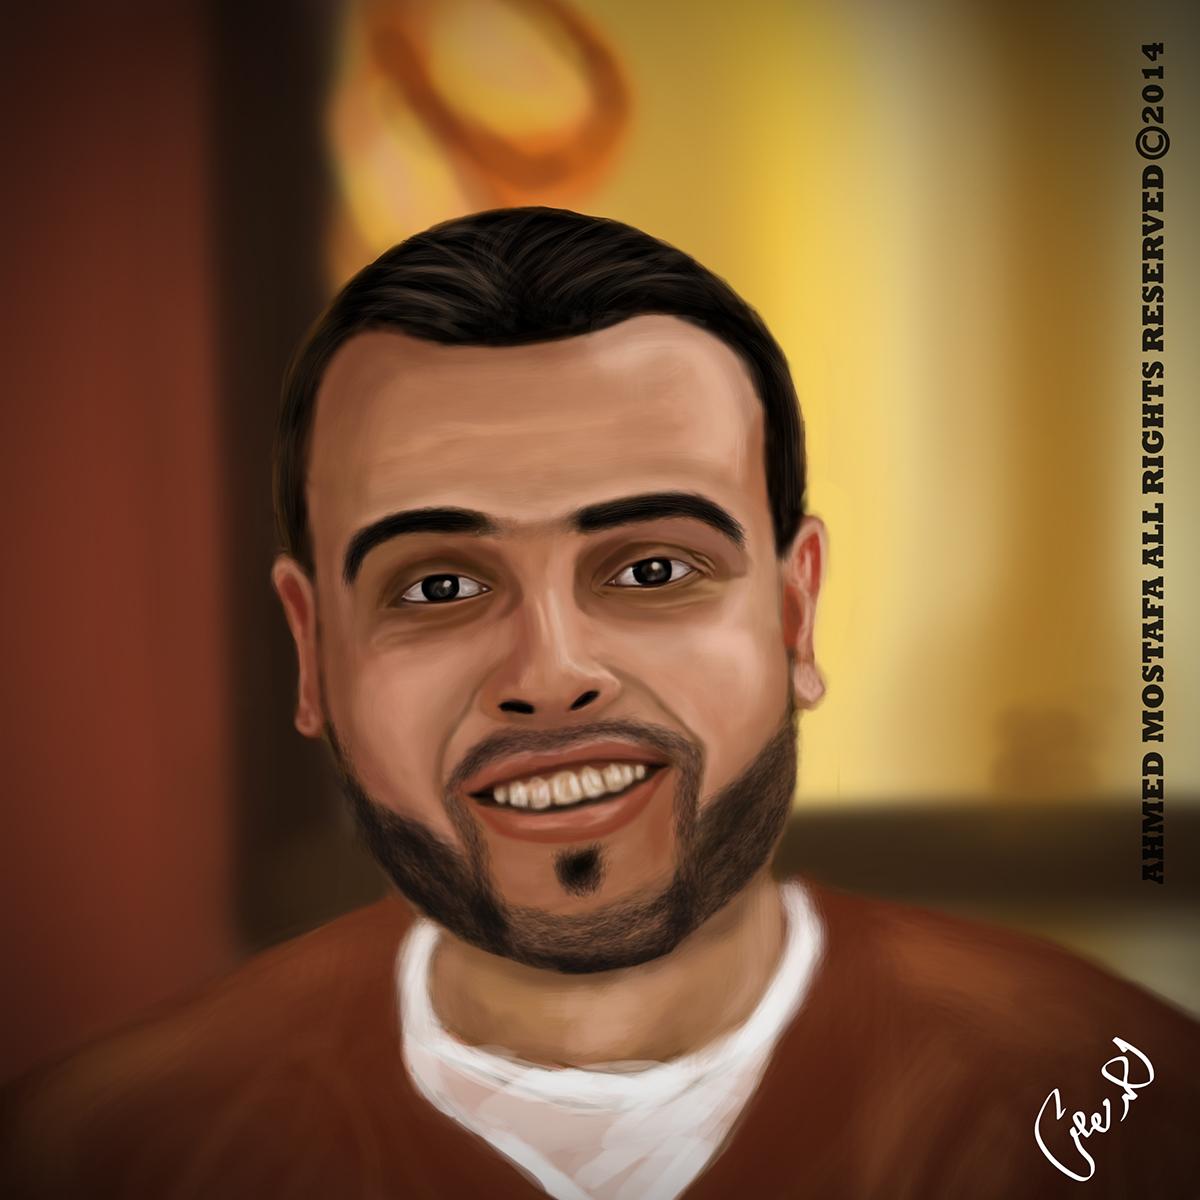 man photoshop egypt shorbagy Zidan paint mahalla dubai akwadweb